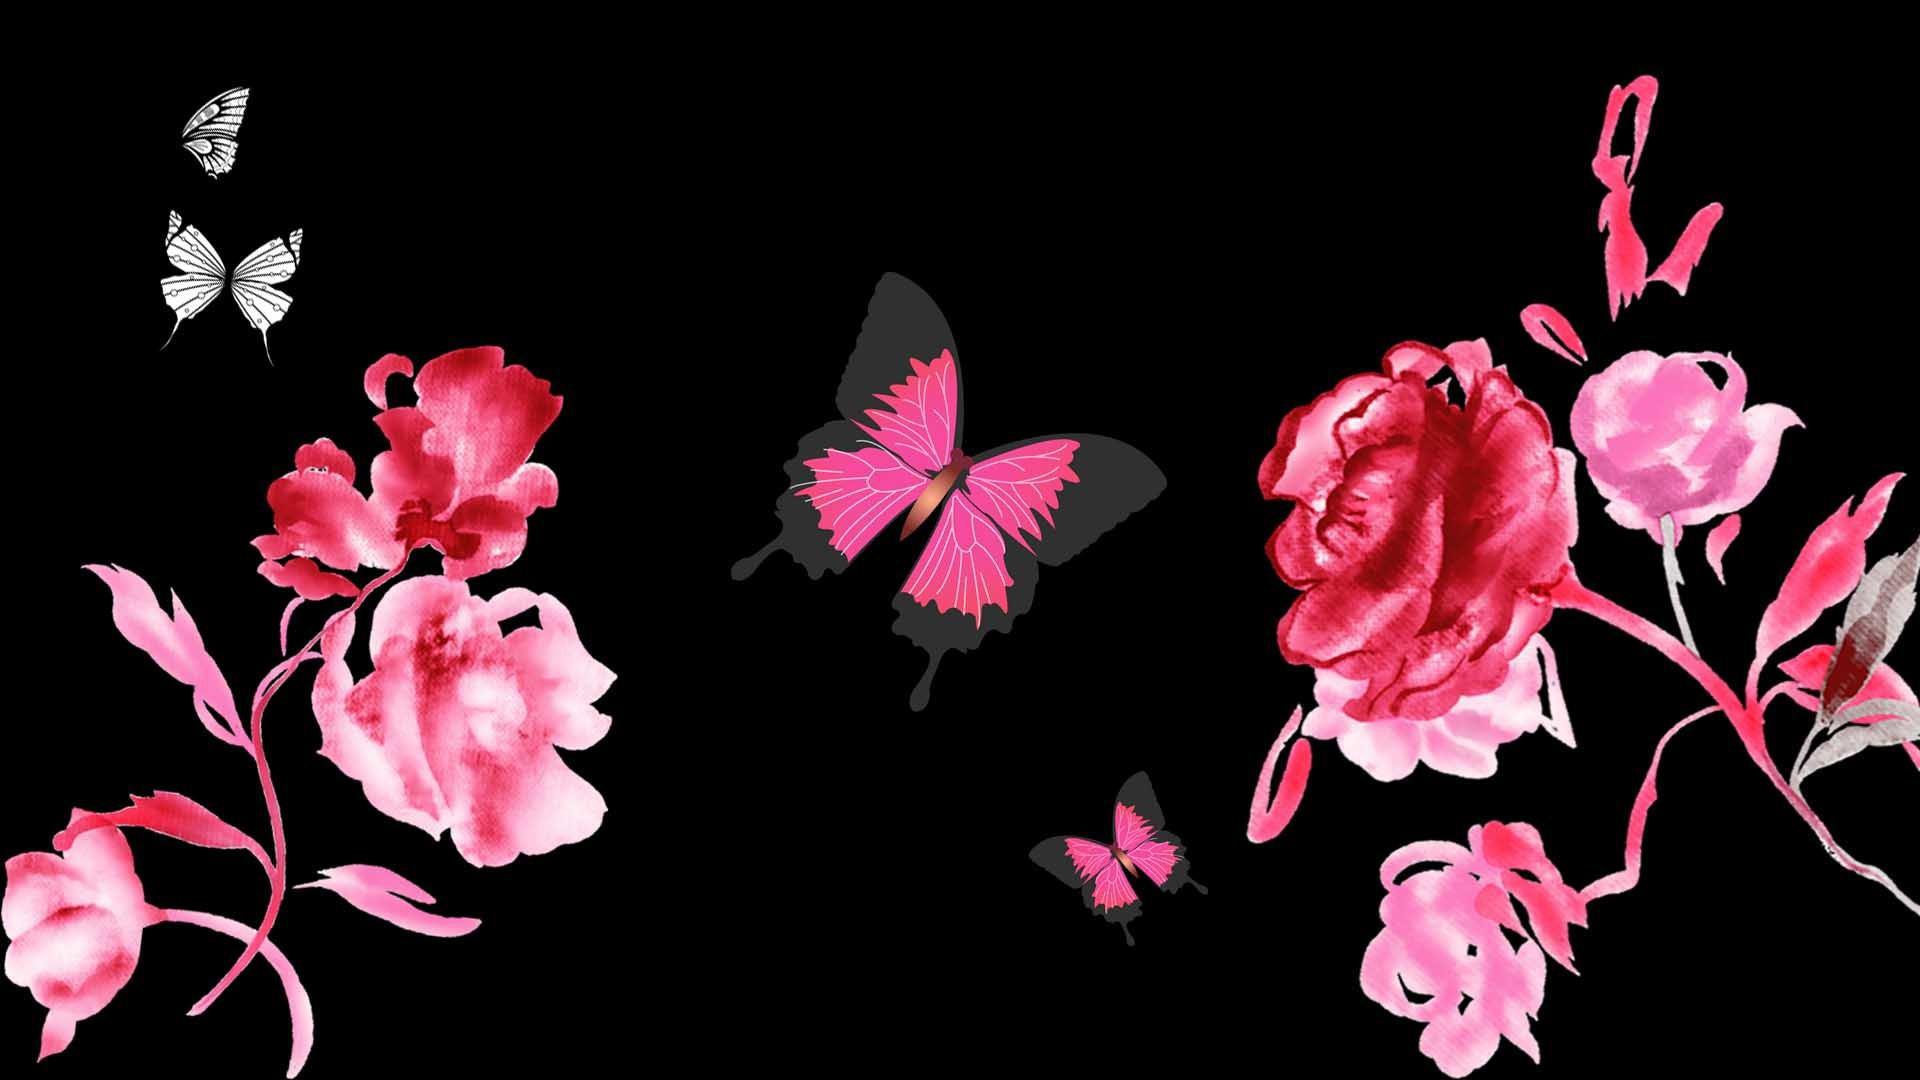 Free Flowers Wallpaper For Phone Wallpapercraft